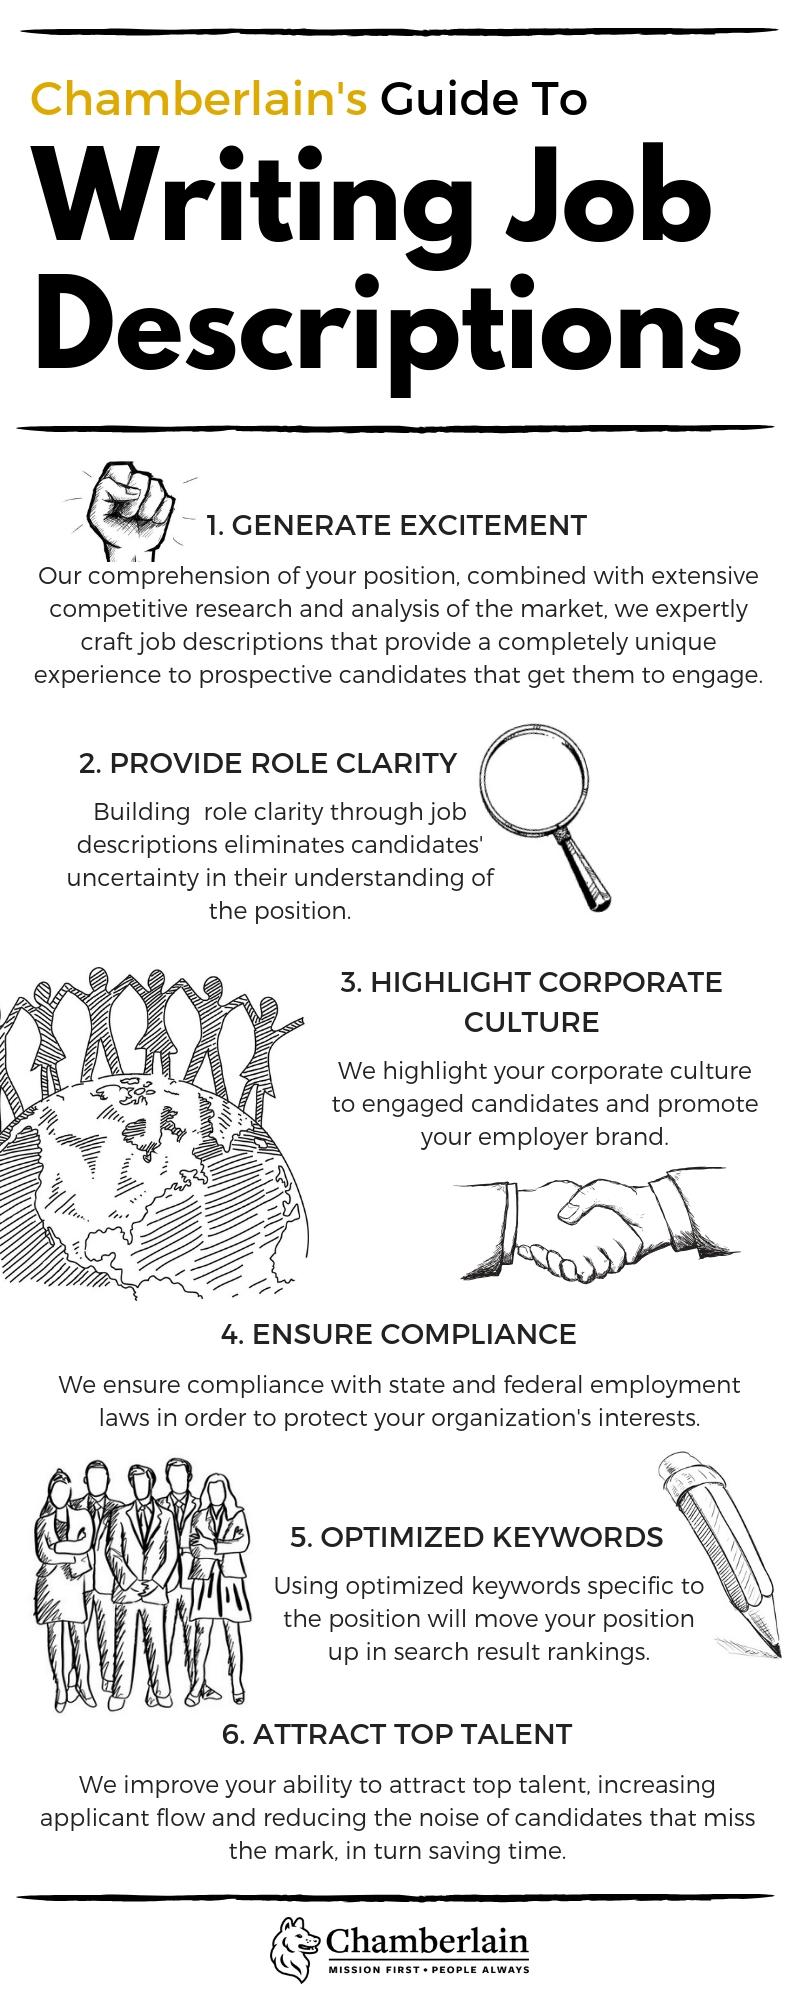 Chamberlain's Guide to Writing Job Descriptions